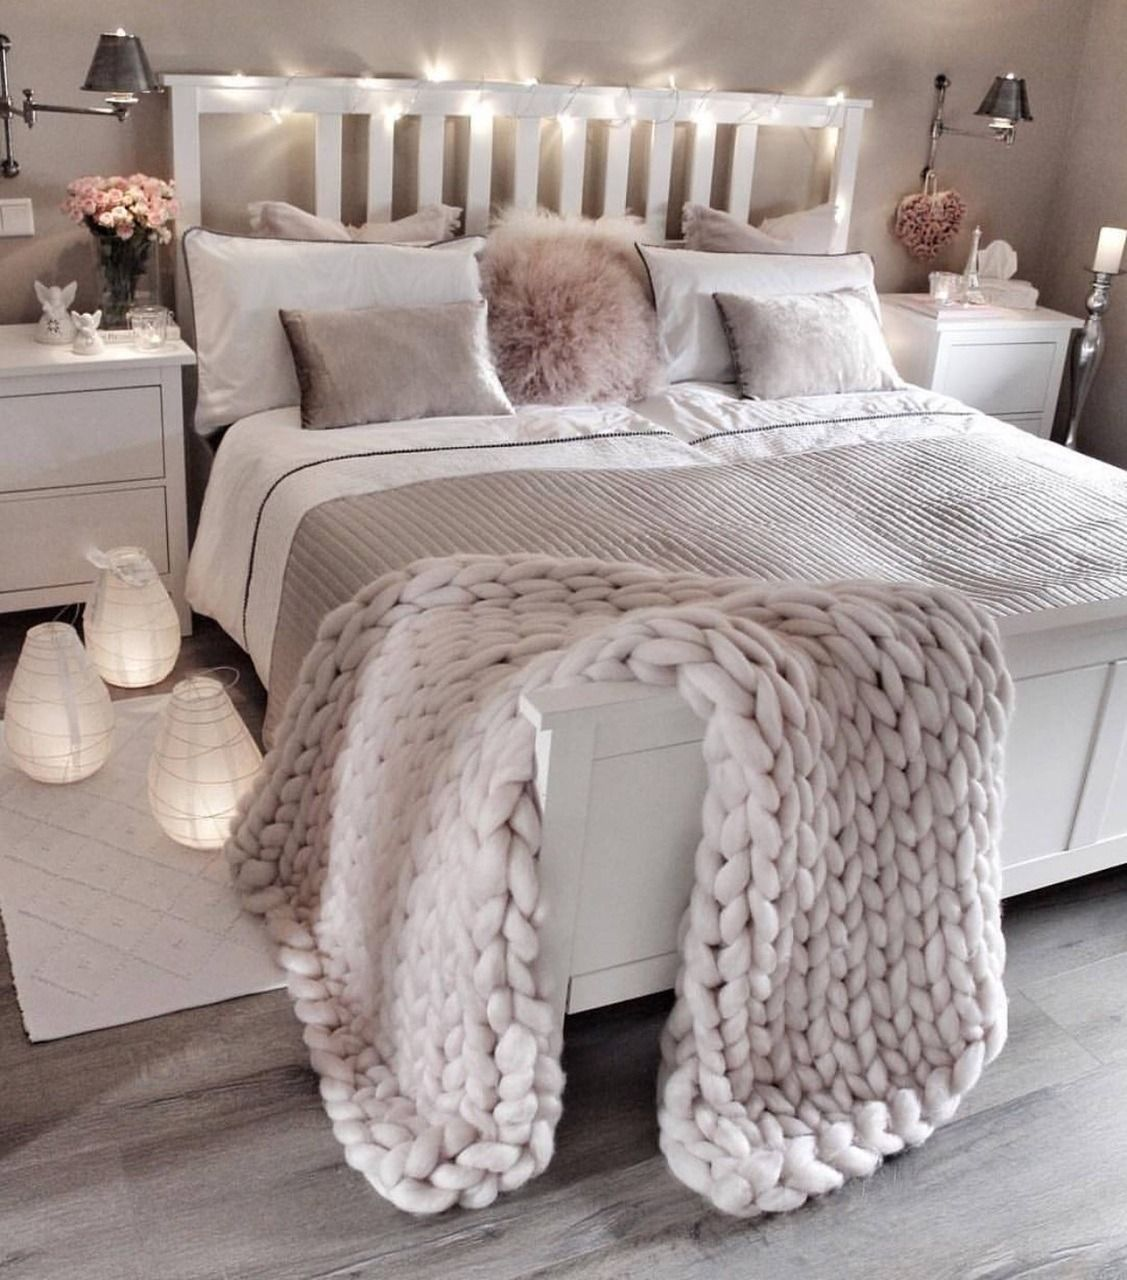 44 Lovely White Bedroom Decorating Ideas For Winter – ROUNDECOR